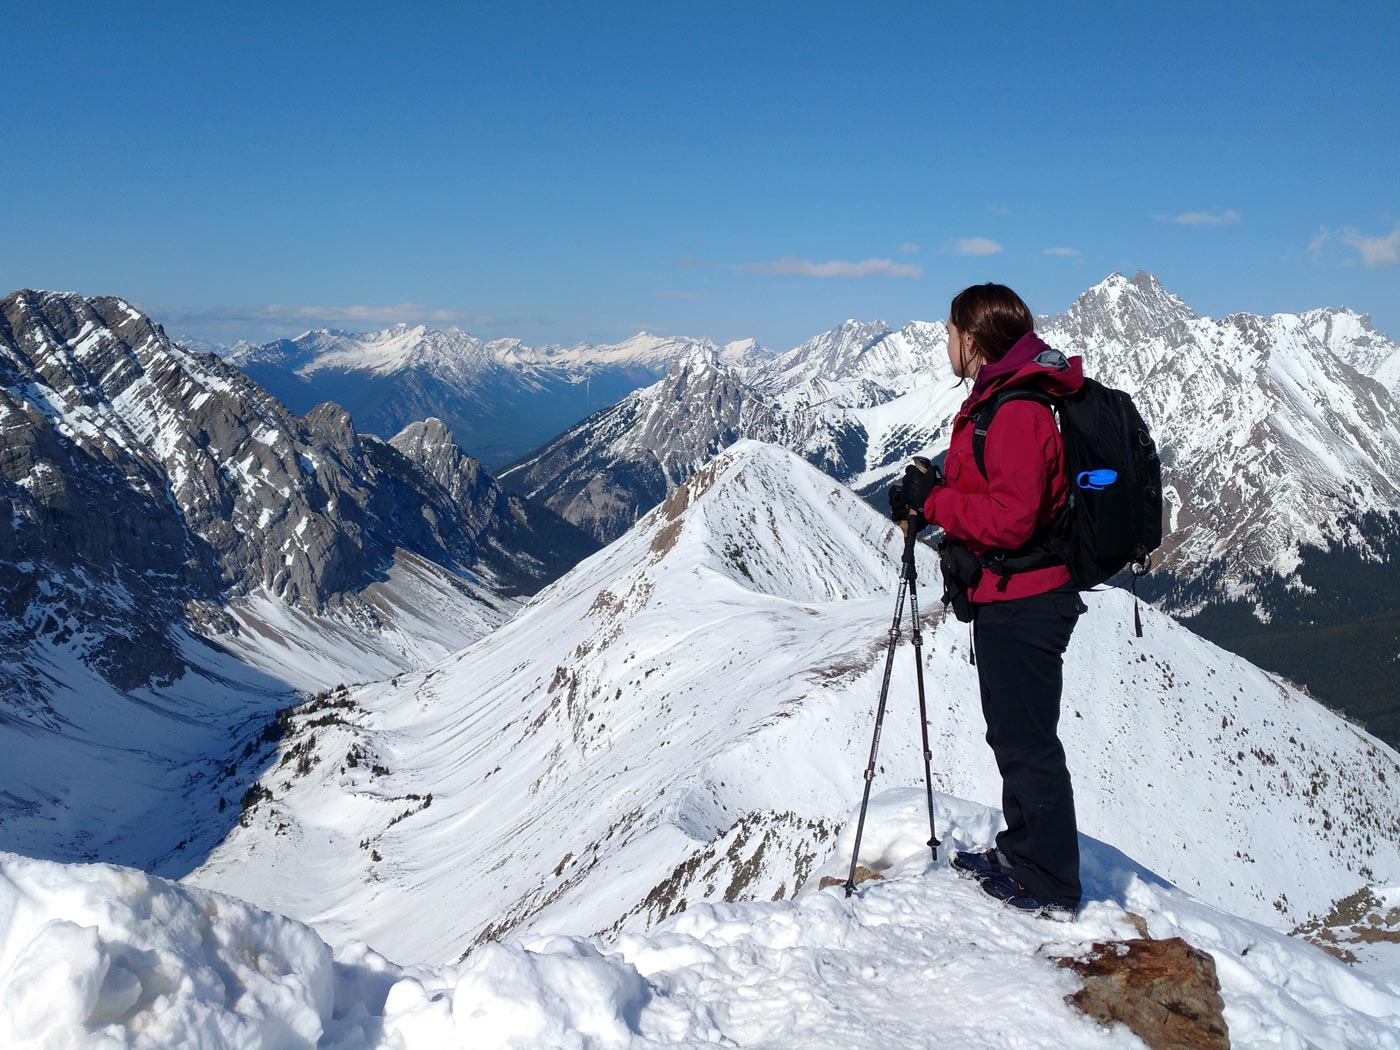 Jolene Rempel atop Pocaterra Ridge in Kananaskis Country, Alberta, Canada.